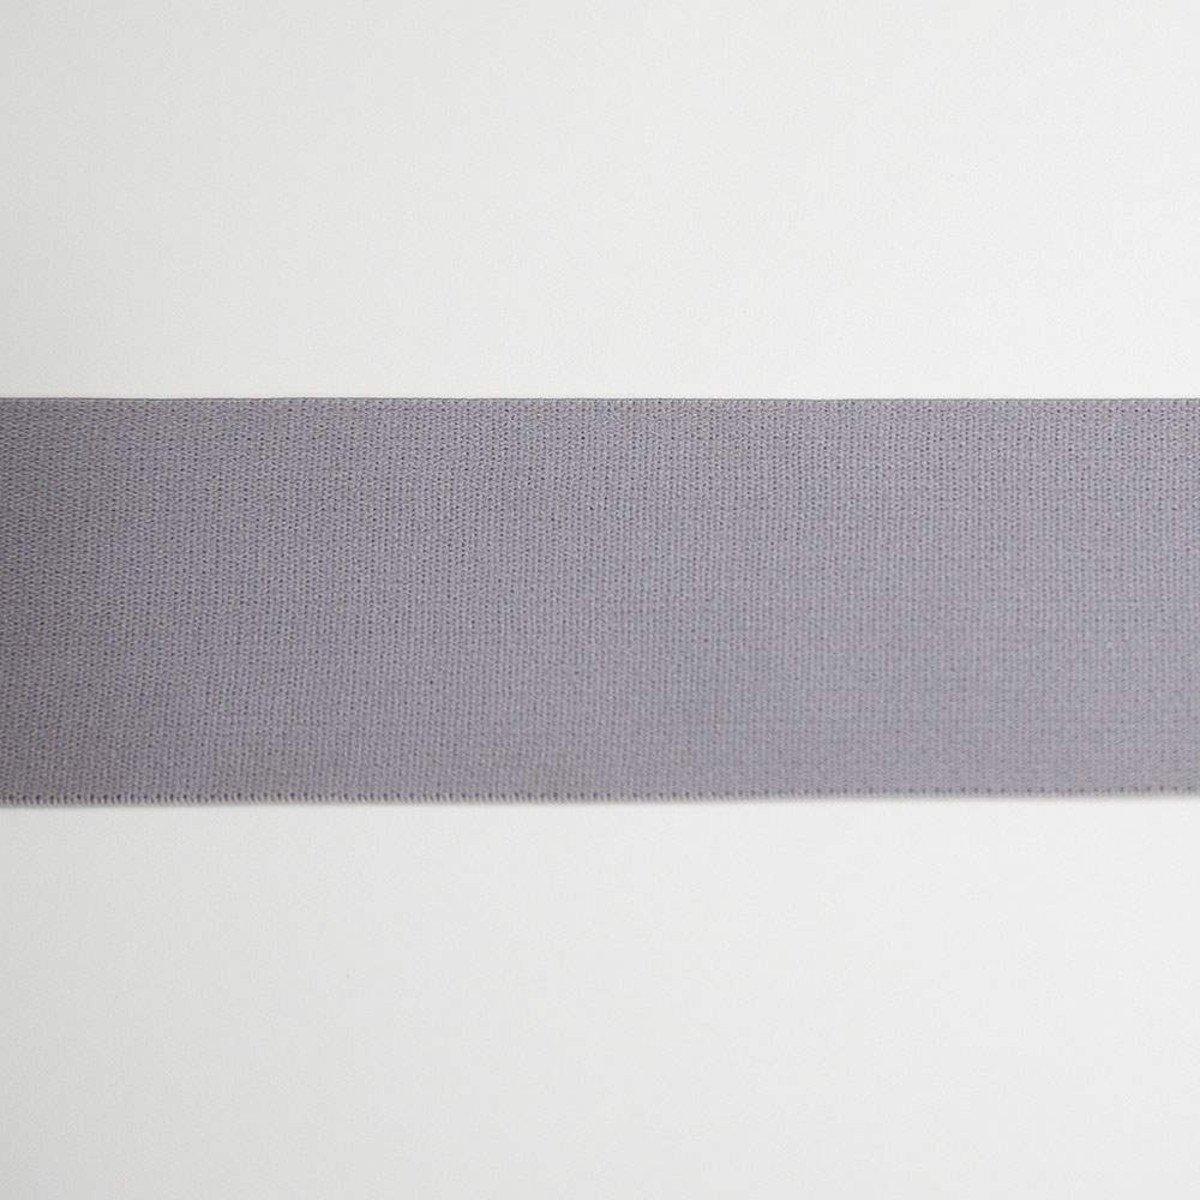 2 inch Waistband Elastic Gray